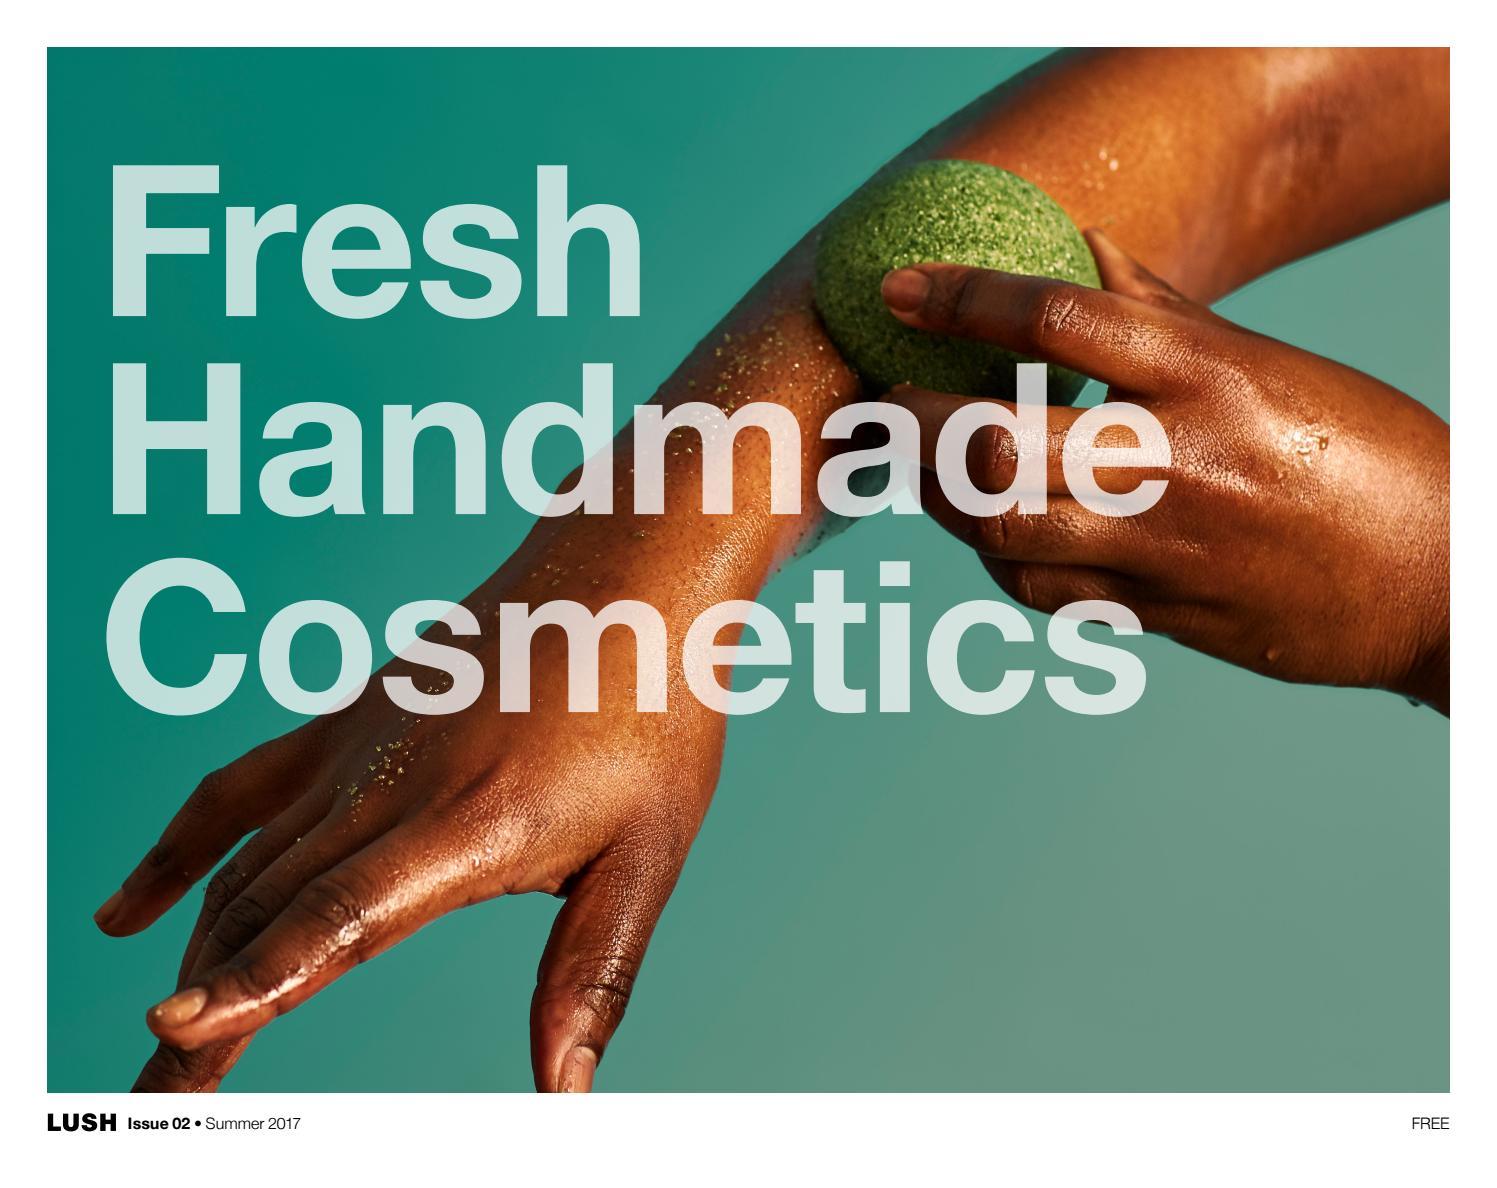 Fresh Handmade Cosmetics: Issue 02 - Summer 2017 (USA) by Lush ...